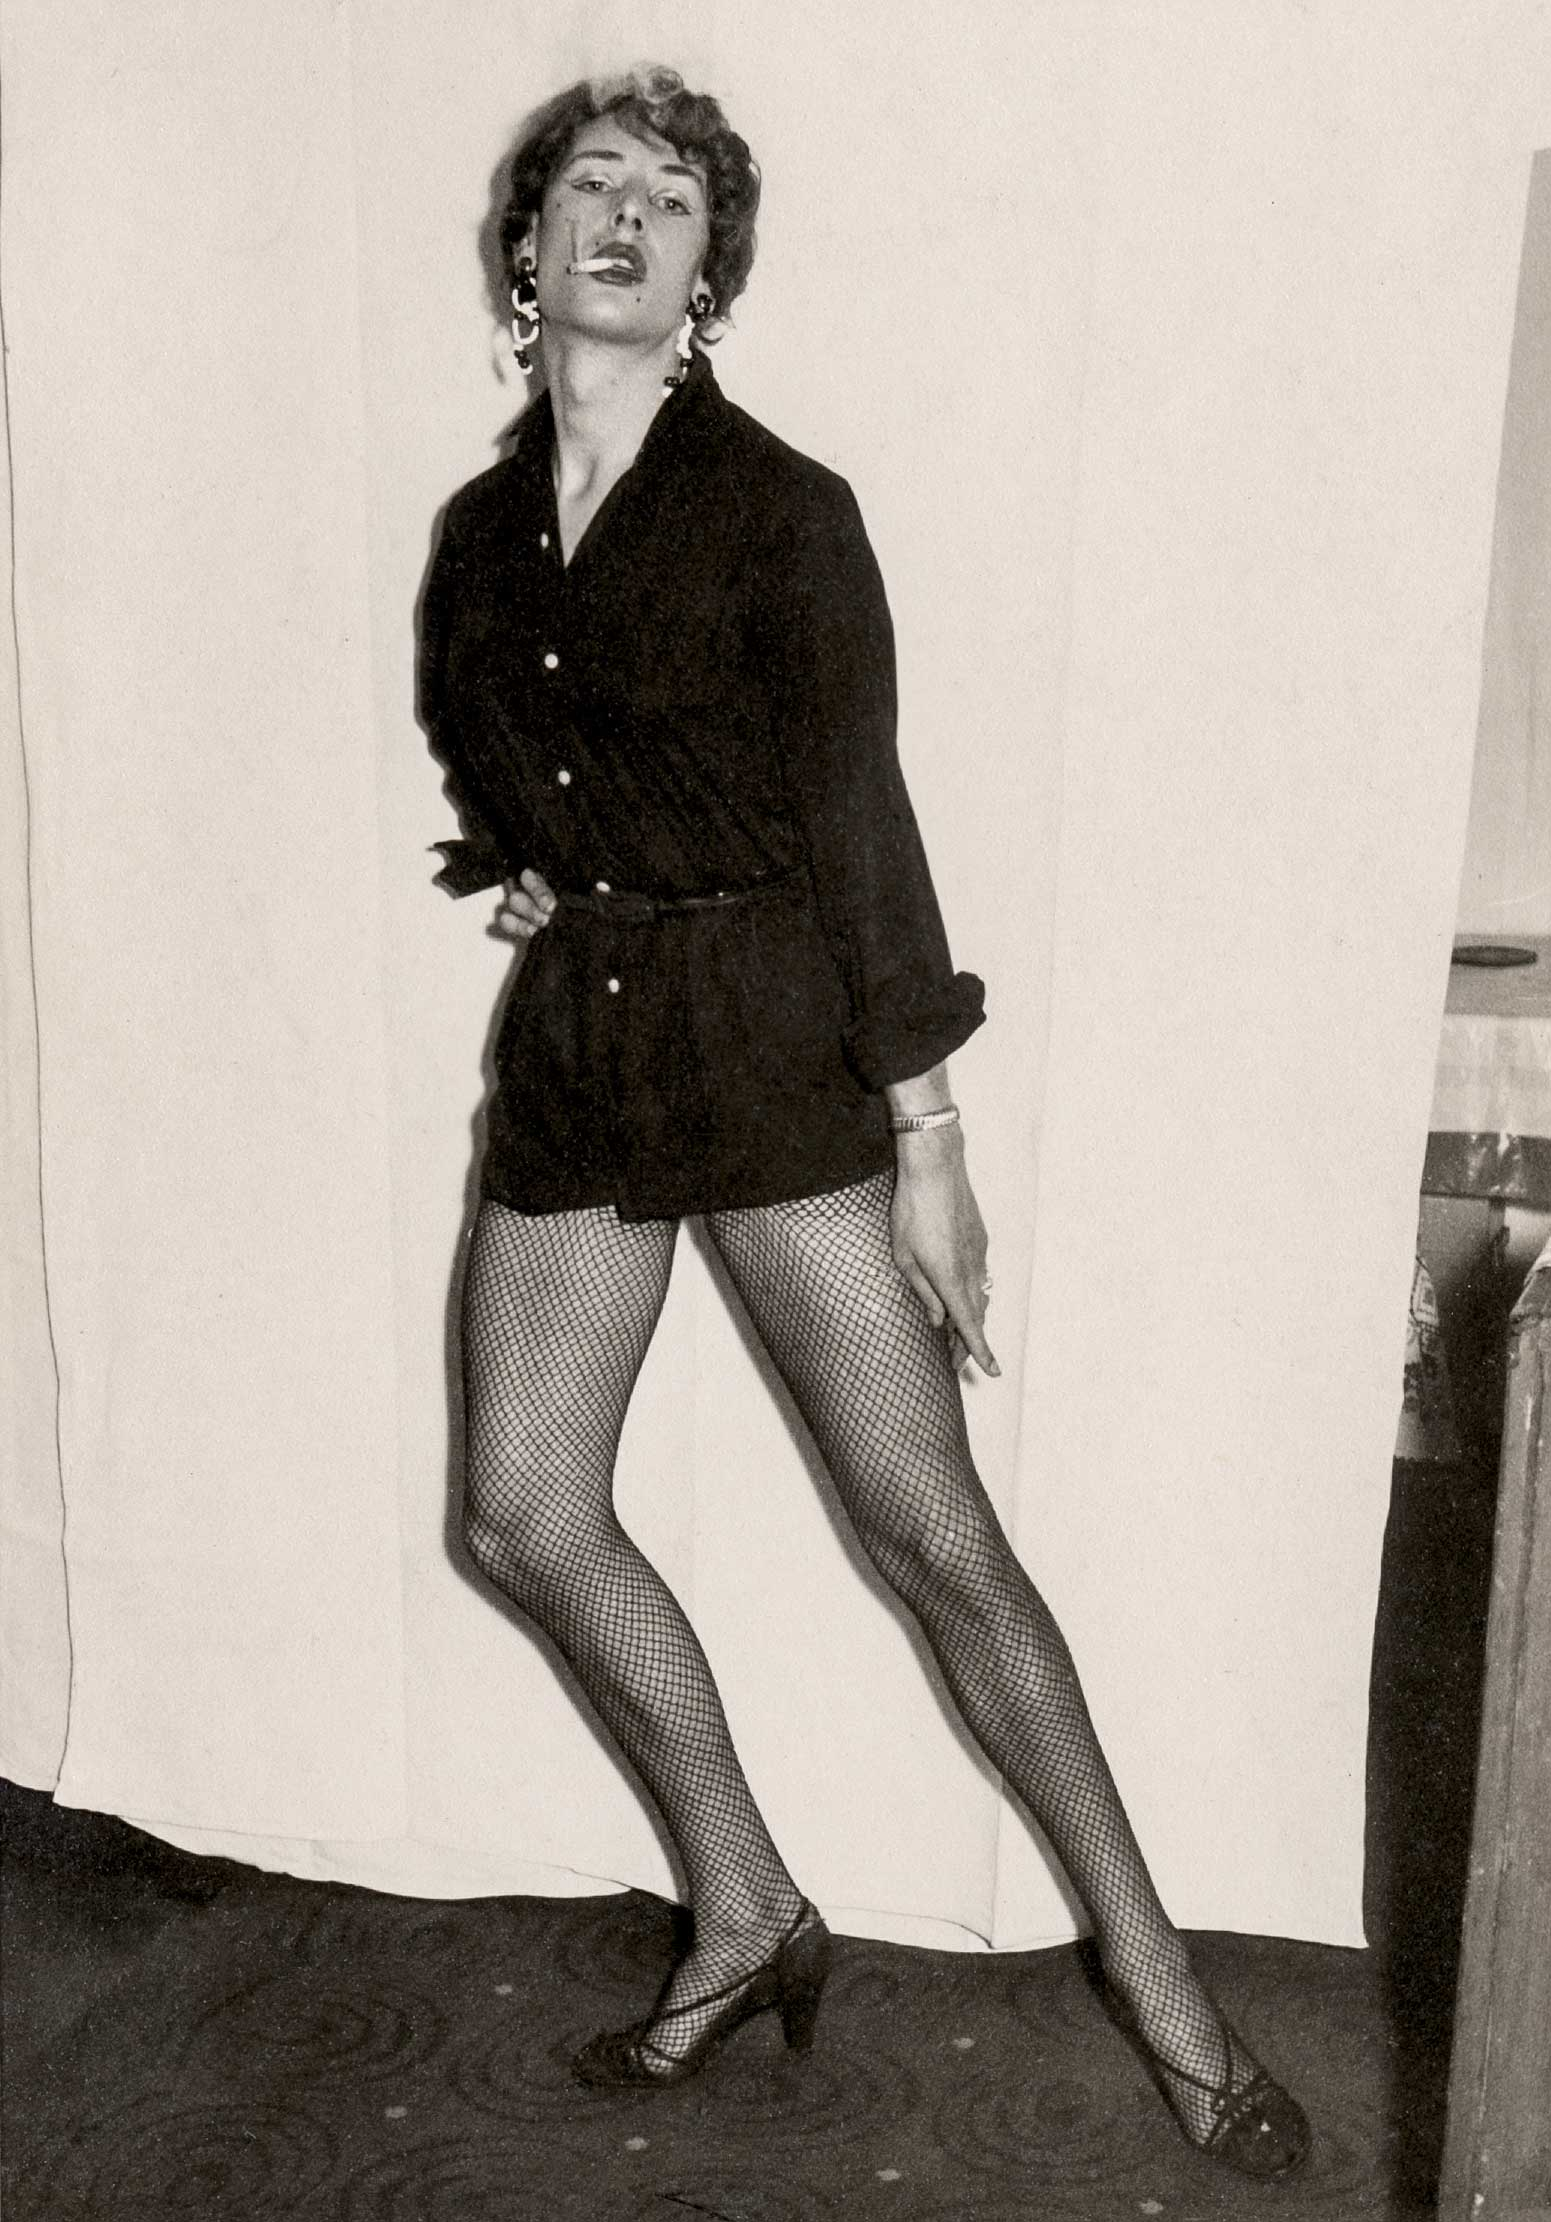 Man dressed as a woman, Mannheim, Germany, circa 1960.